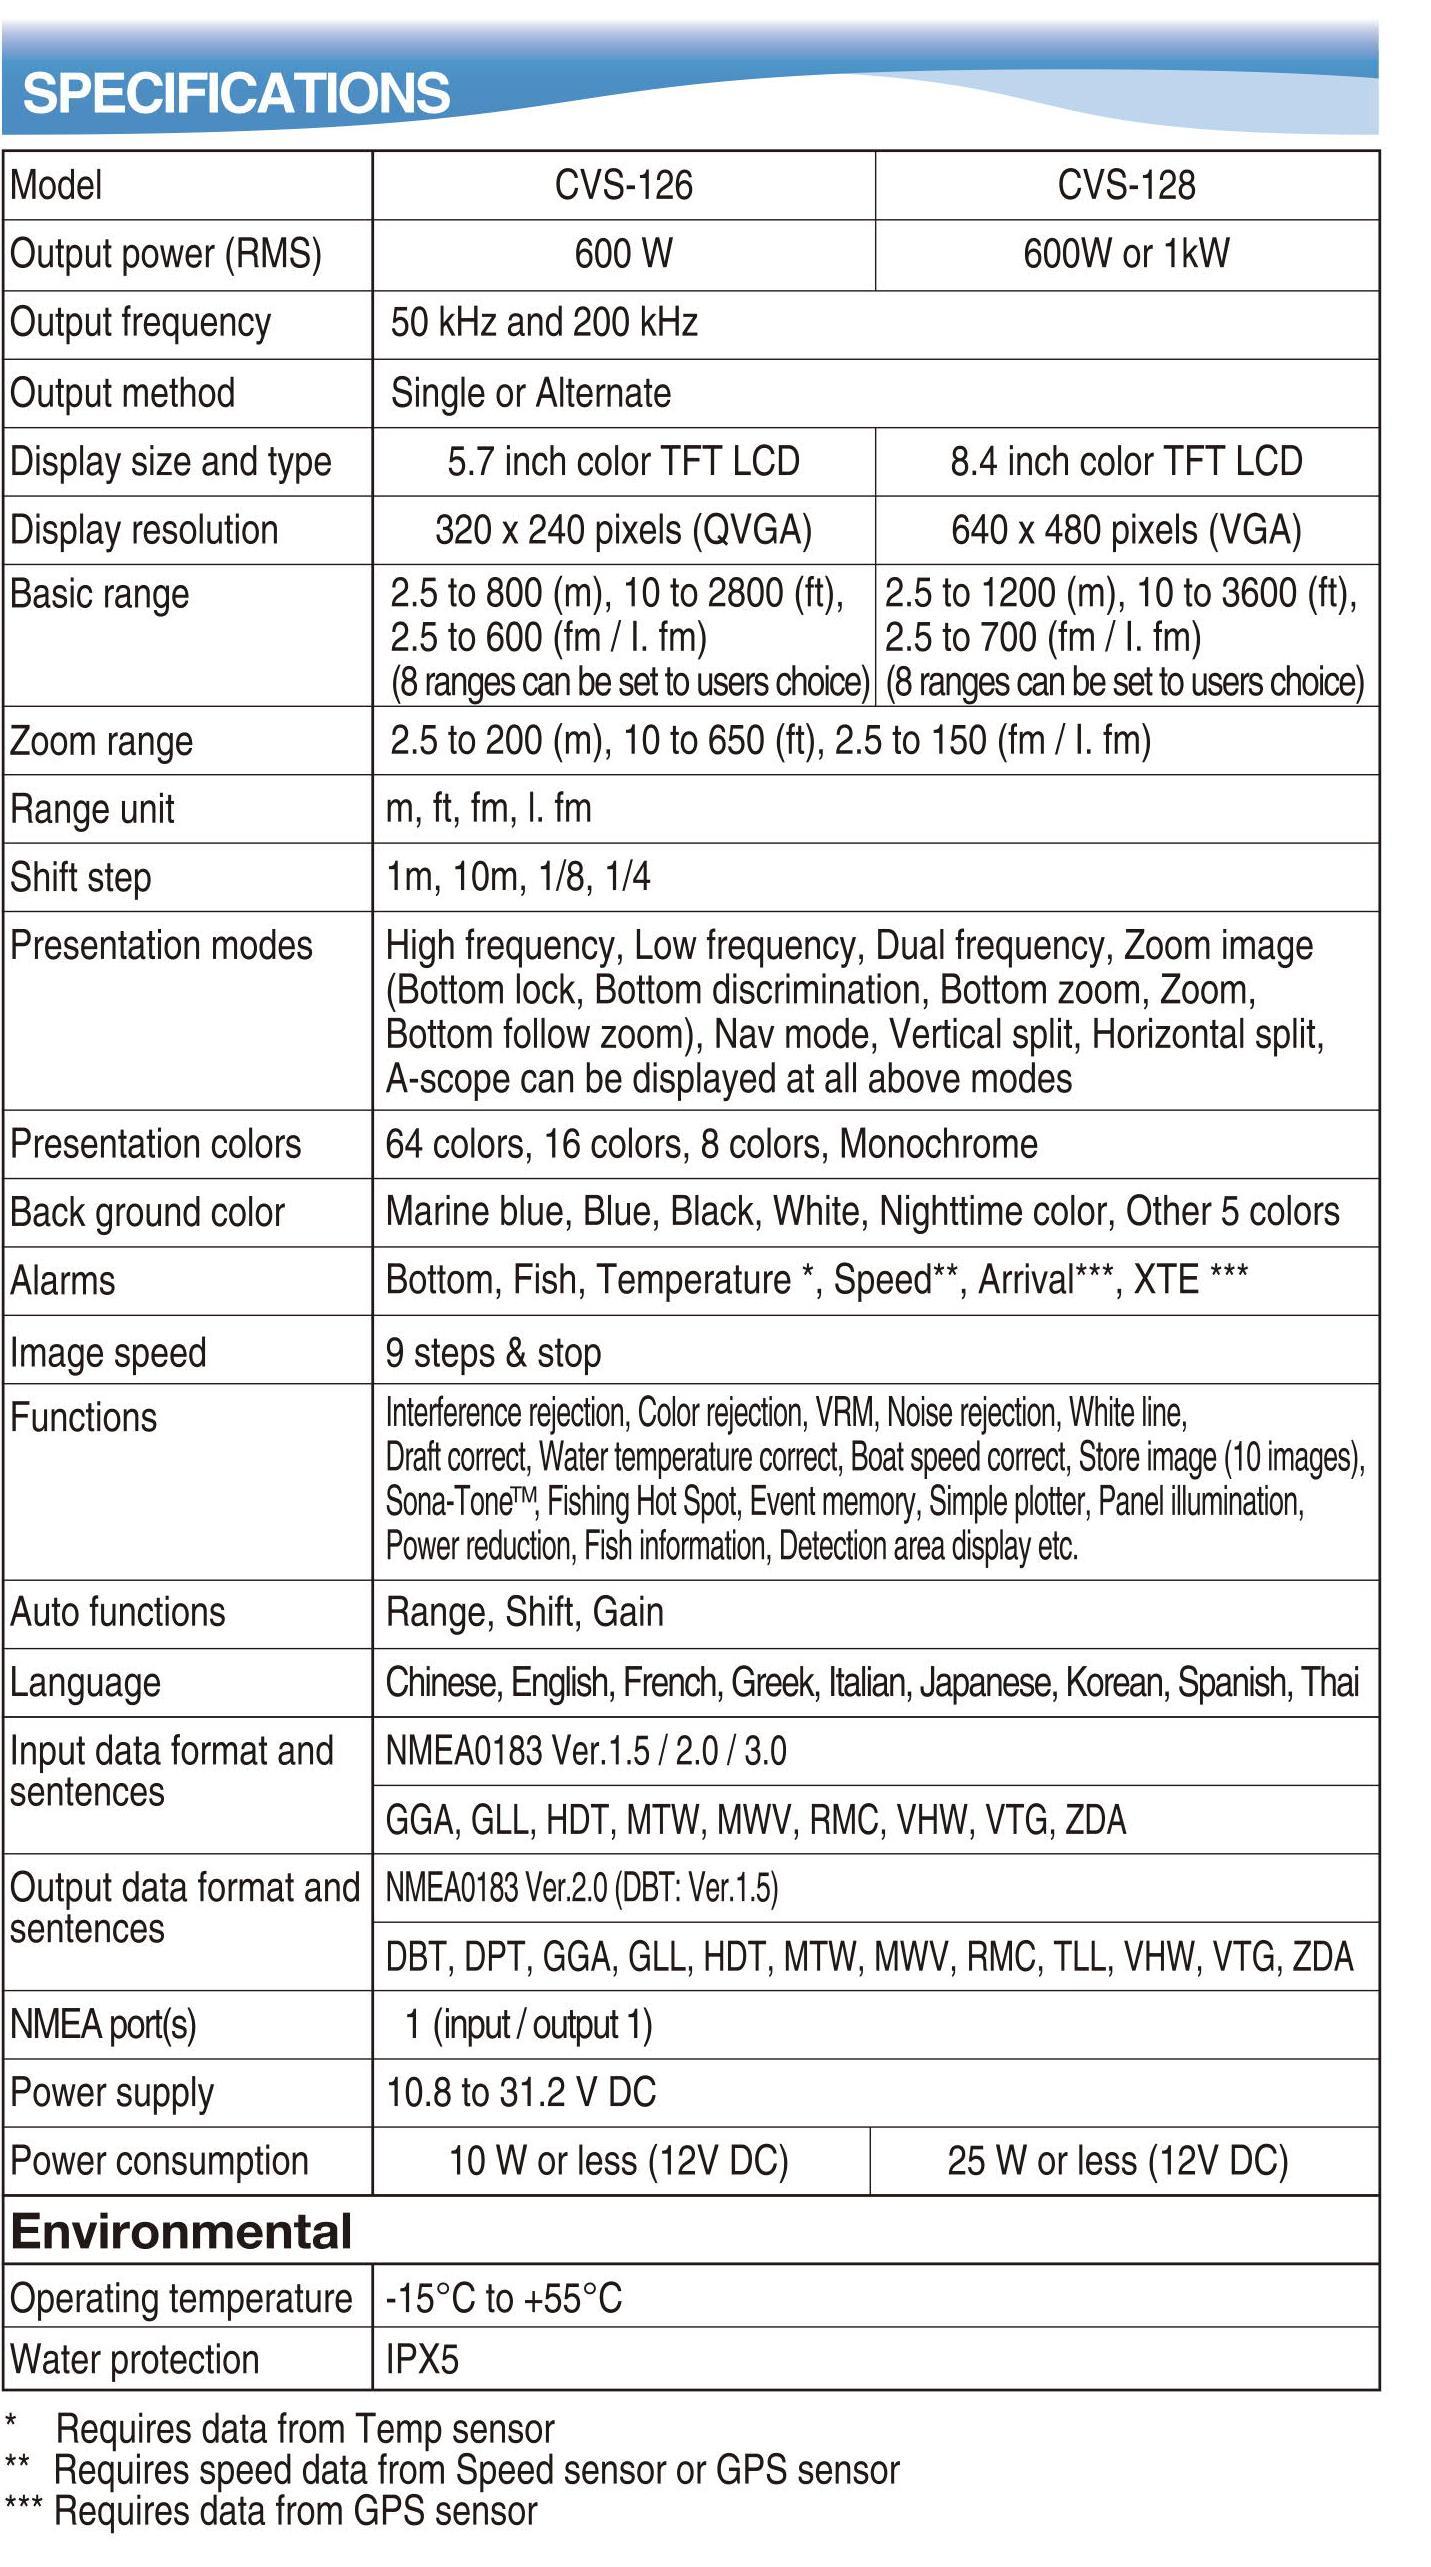 Koden Echo Sounder Cvs 126 Sitex Transducer Wiring Diagram Colors 1 X K0458540052 Td500t3b Xdcr Brz 600w Cvs126 Td 500t 3b 50 200 Khz B Thru Hull Bronze